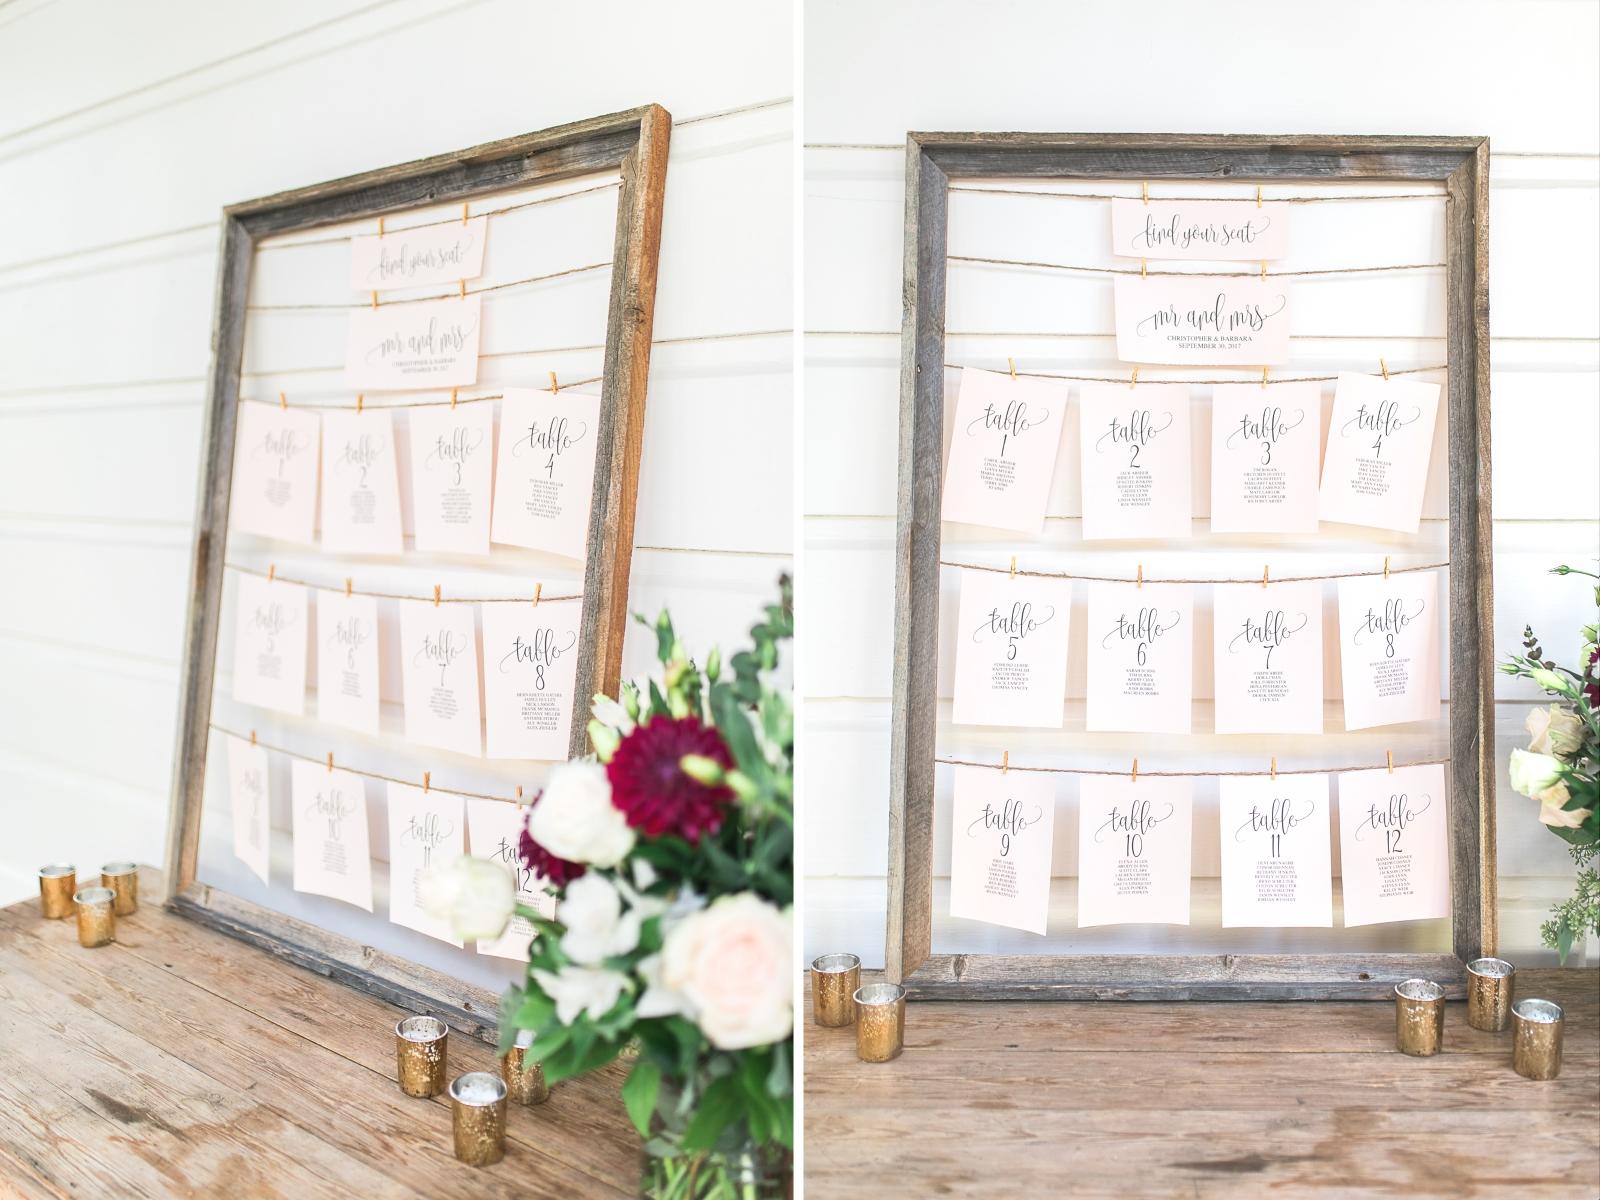 Generals+Daughter+Wedding+Photos+by+JBJ+Pictures+-+Ramekins+Wedding+Venue+Photographer+in+Sonoma+Napa+(19).jpg